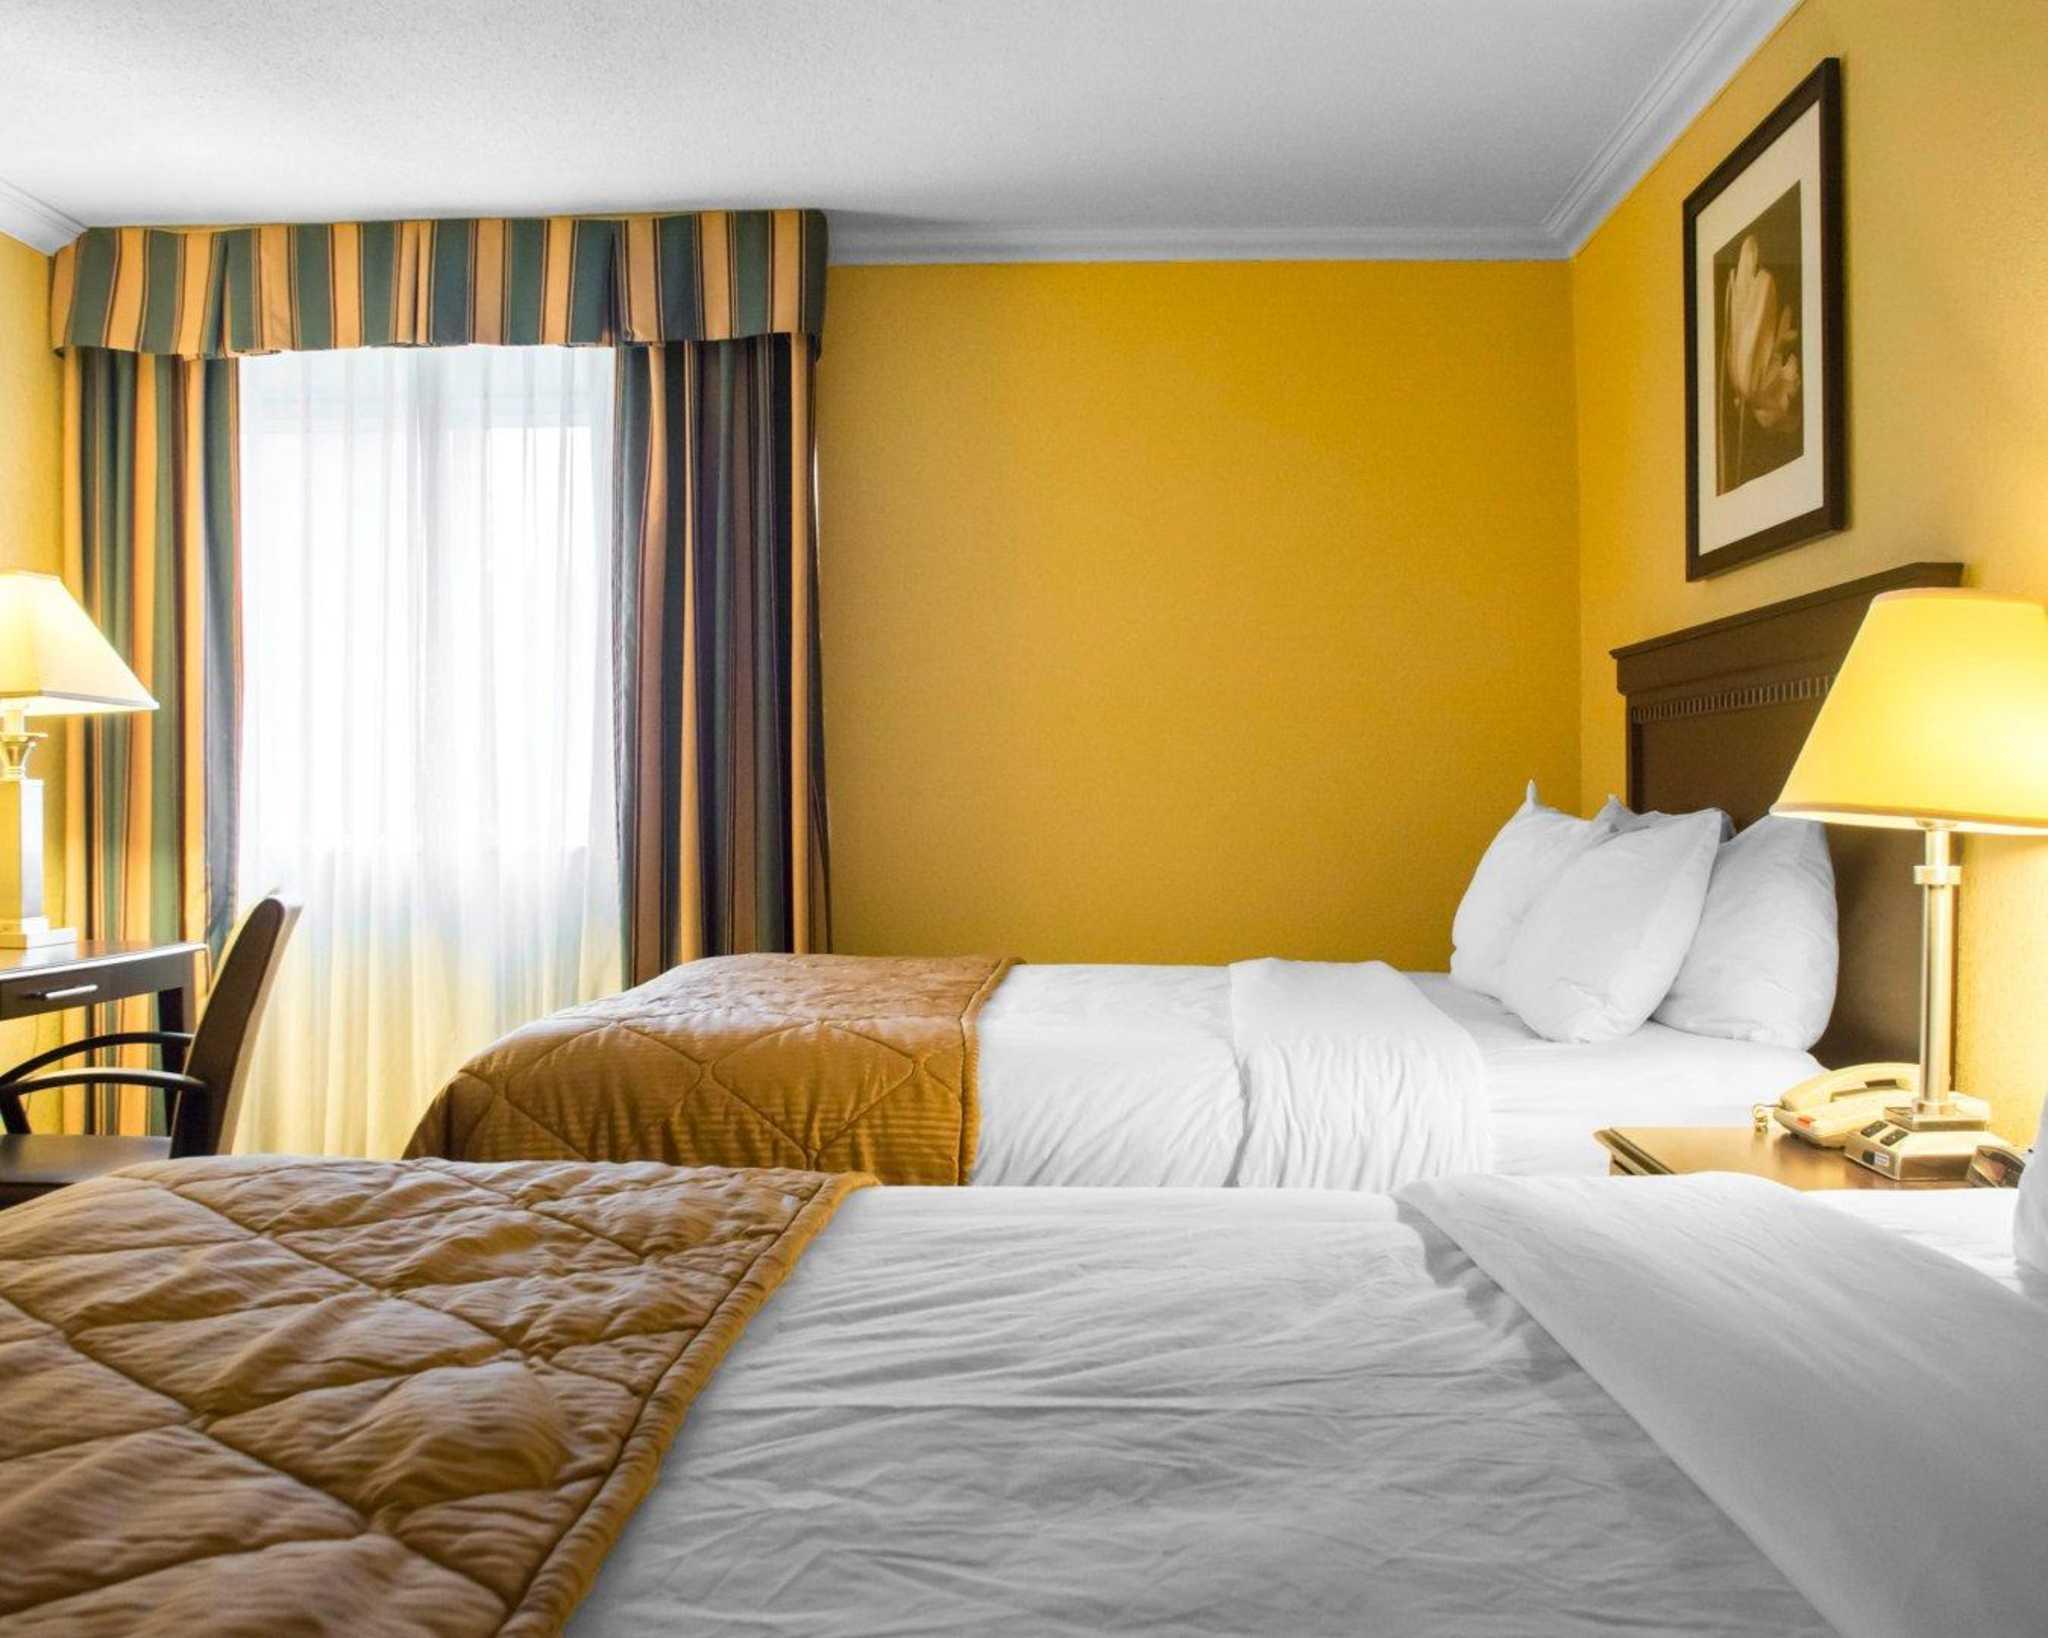 Quality Inn & Suites Fairgrounds image 15